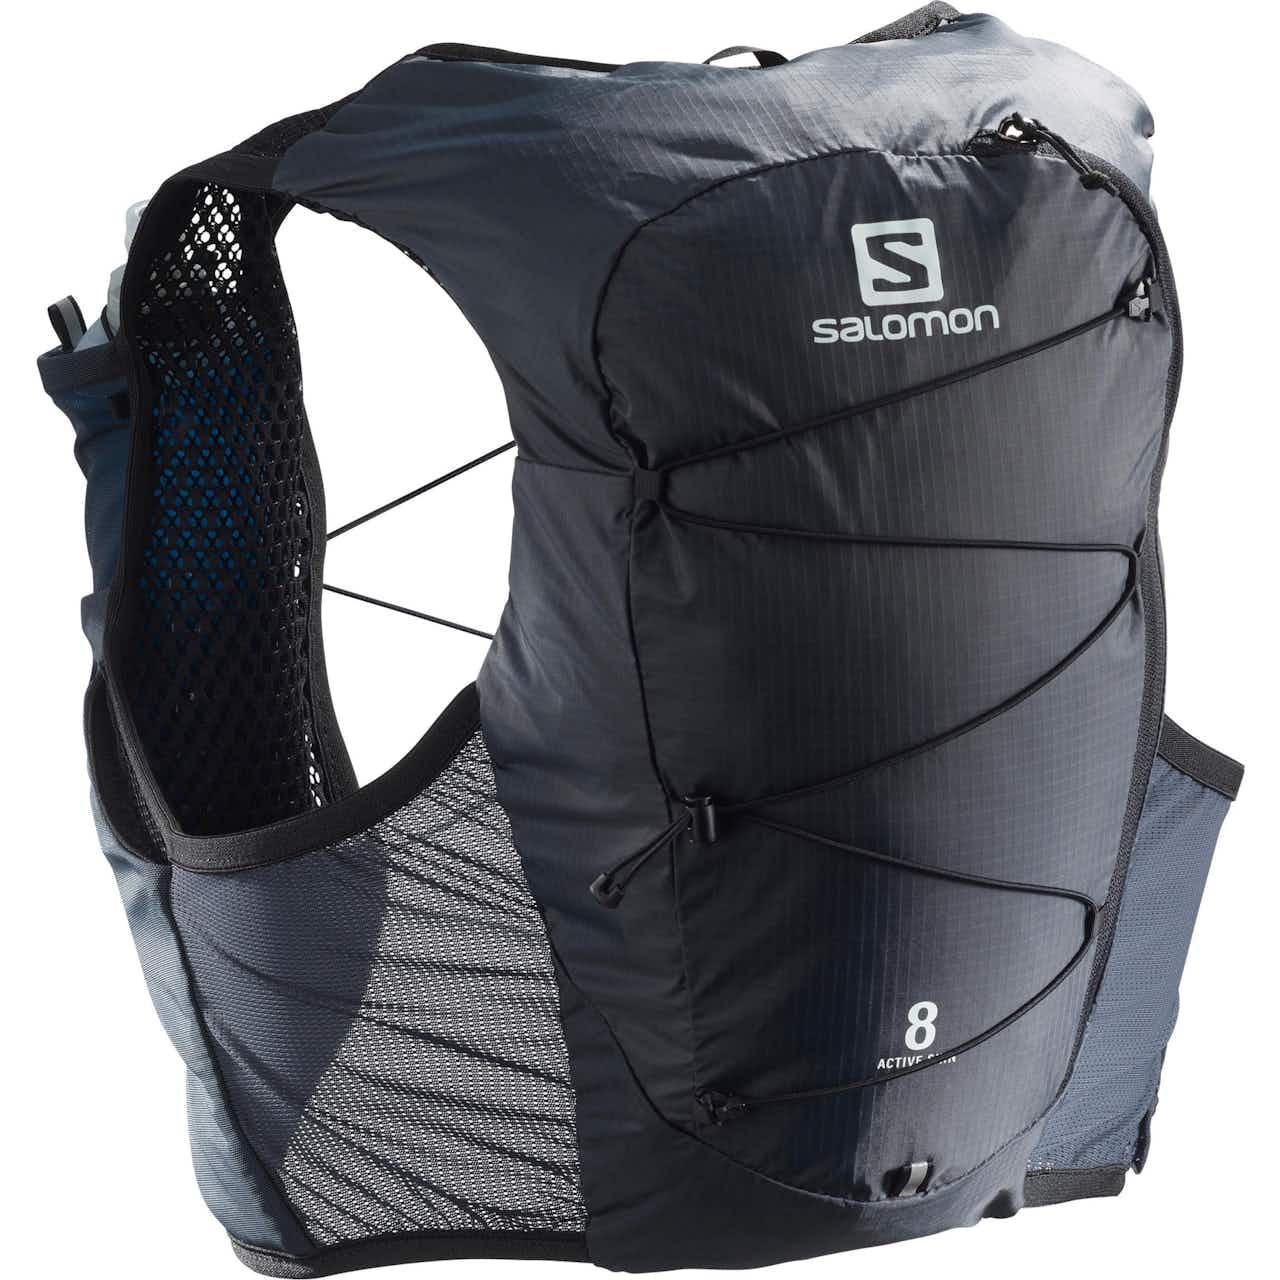 Salomon ACTIVE SKIN 8 SET-Ebony-Black- Trinkrucksack